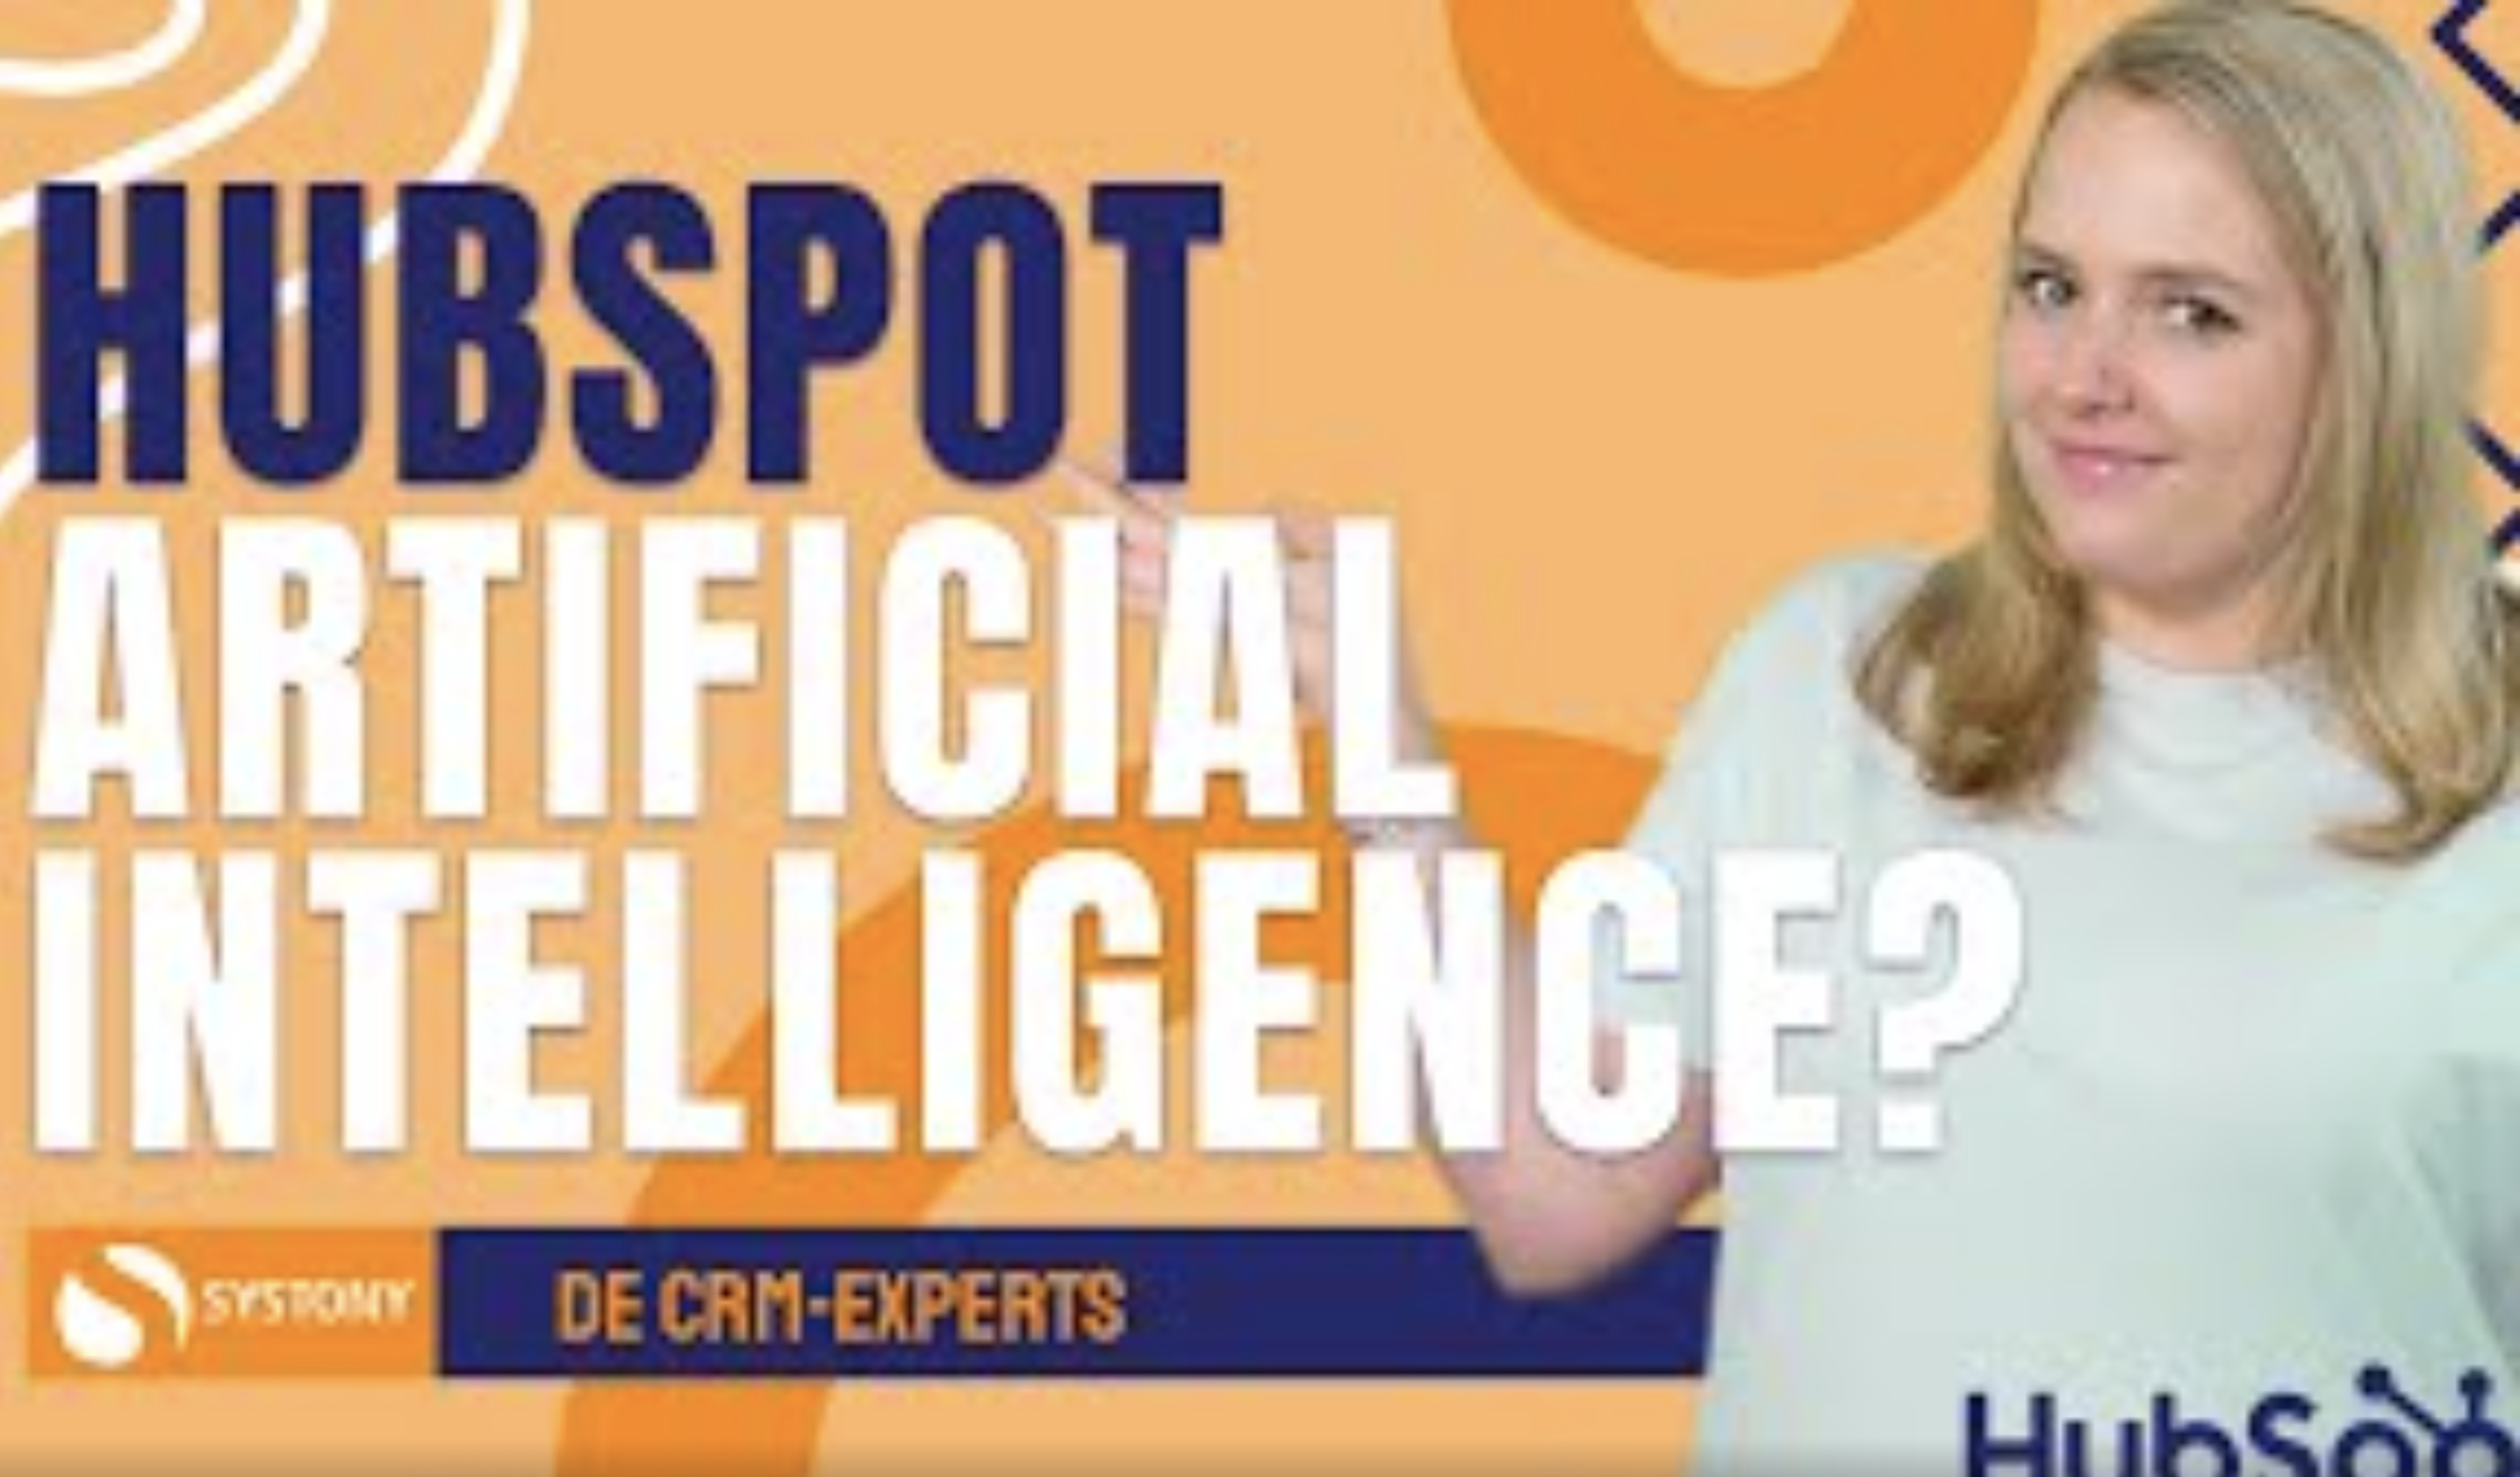 [VIDEO]HubSpot Artificial Intelligence - Hoe kan het jou helpen?